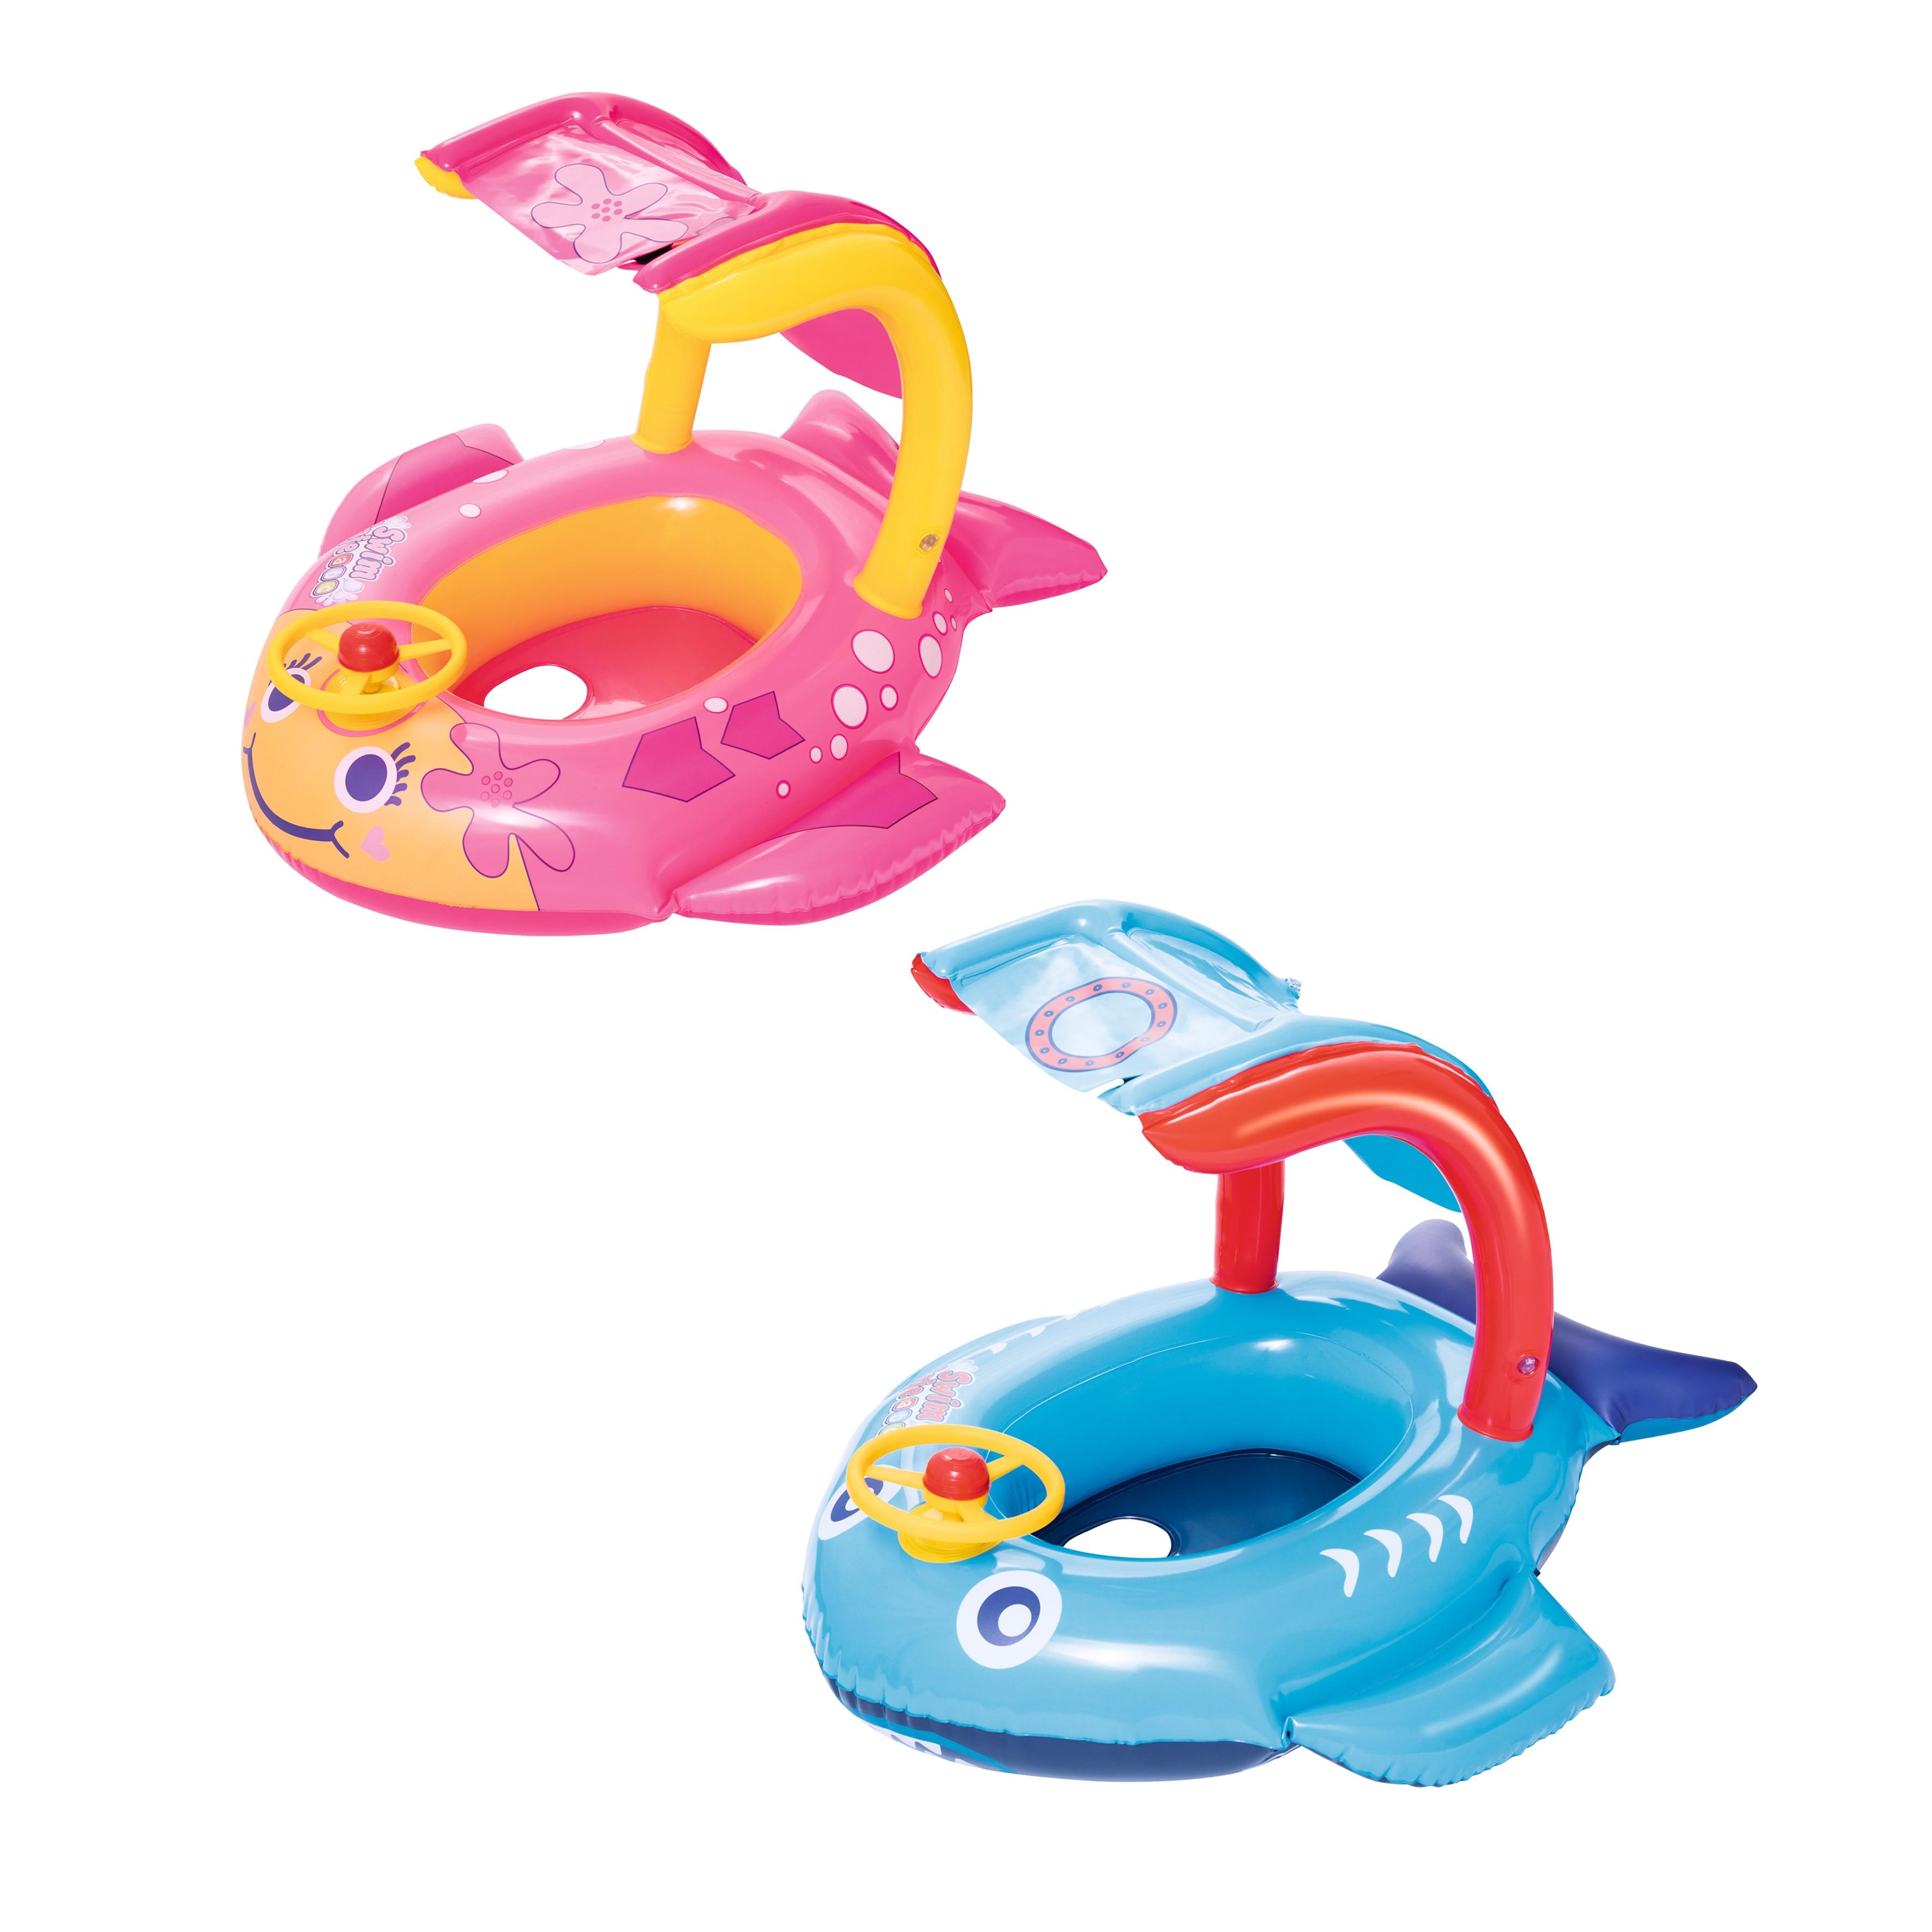 Inflatable плотик Swimming Children's, For Children, 81 х66см (shark, Fish), From 1 To 3 Years Old, Bestway, Item No. 34108ne